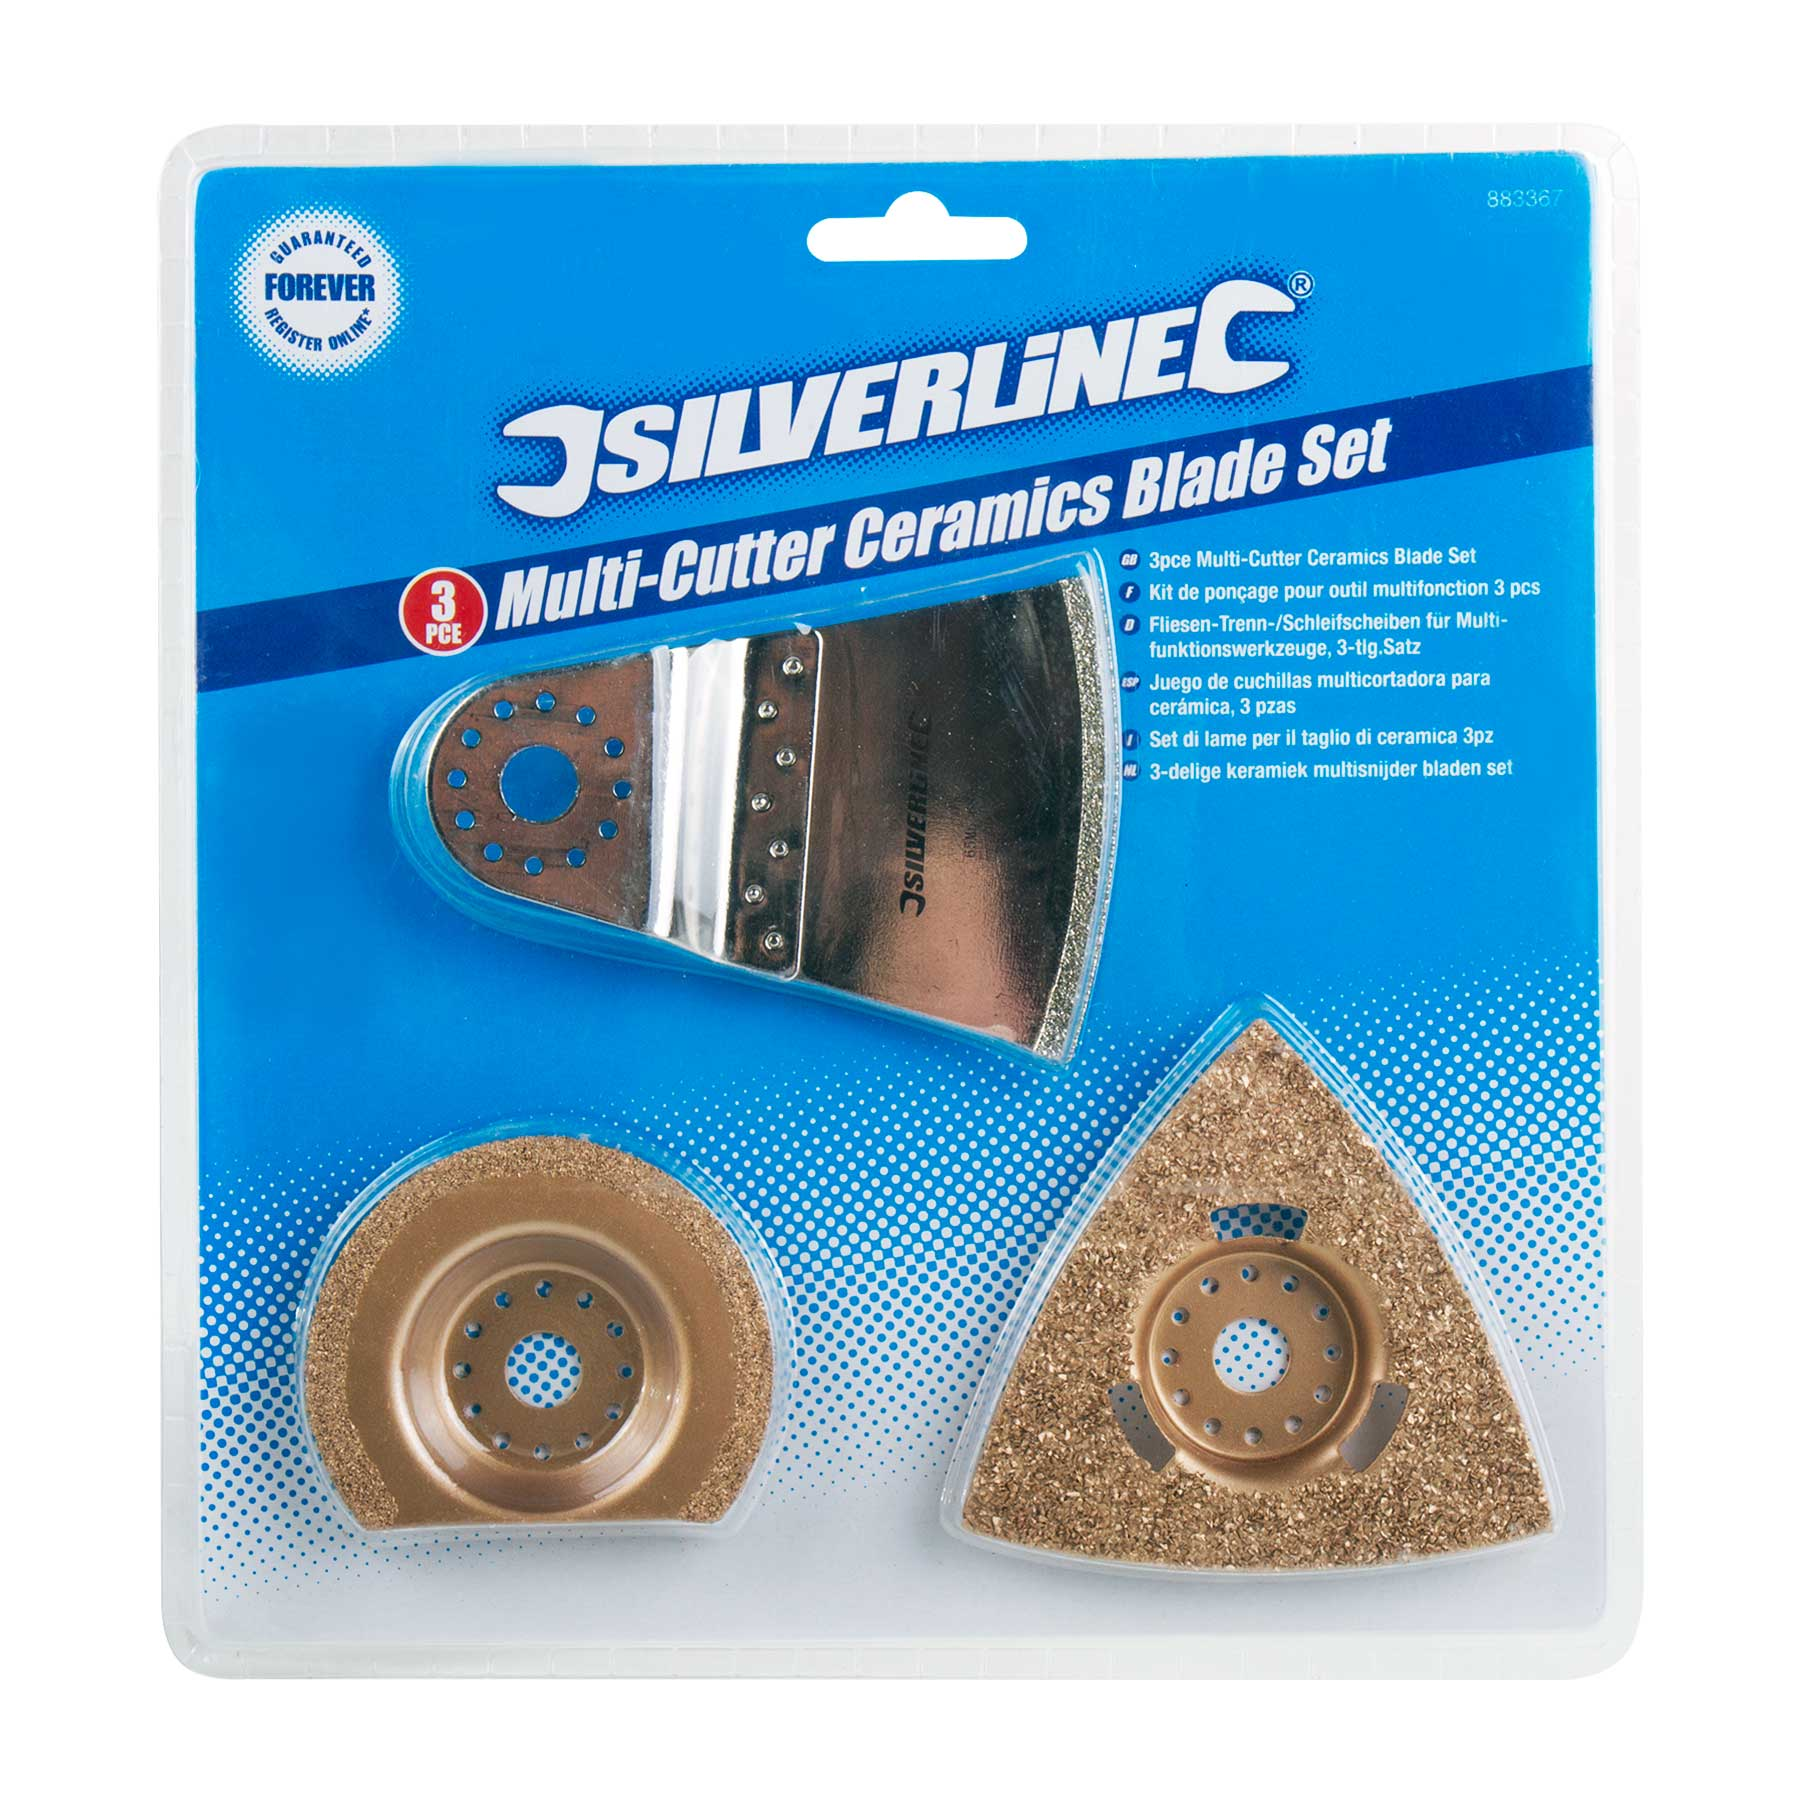 Silverline Oscillating Multi Tool Ceramic Tile Grout